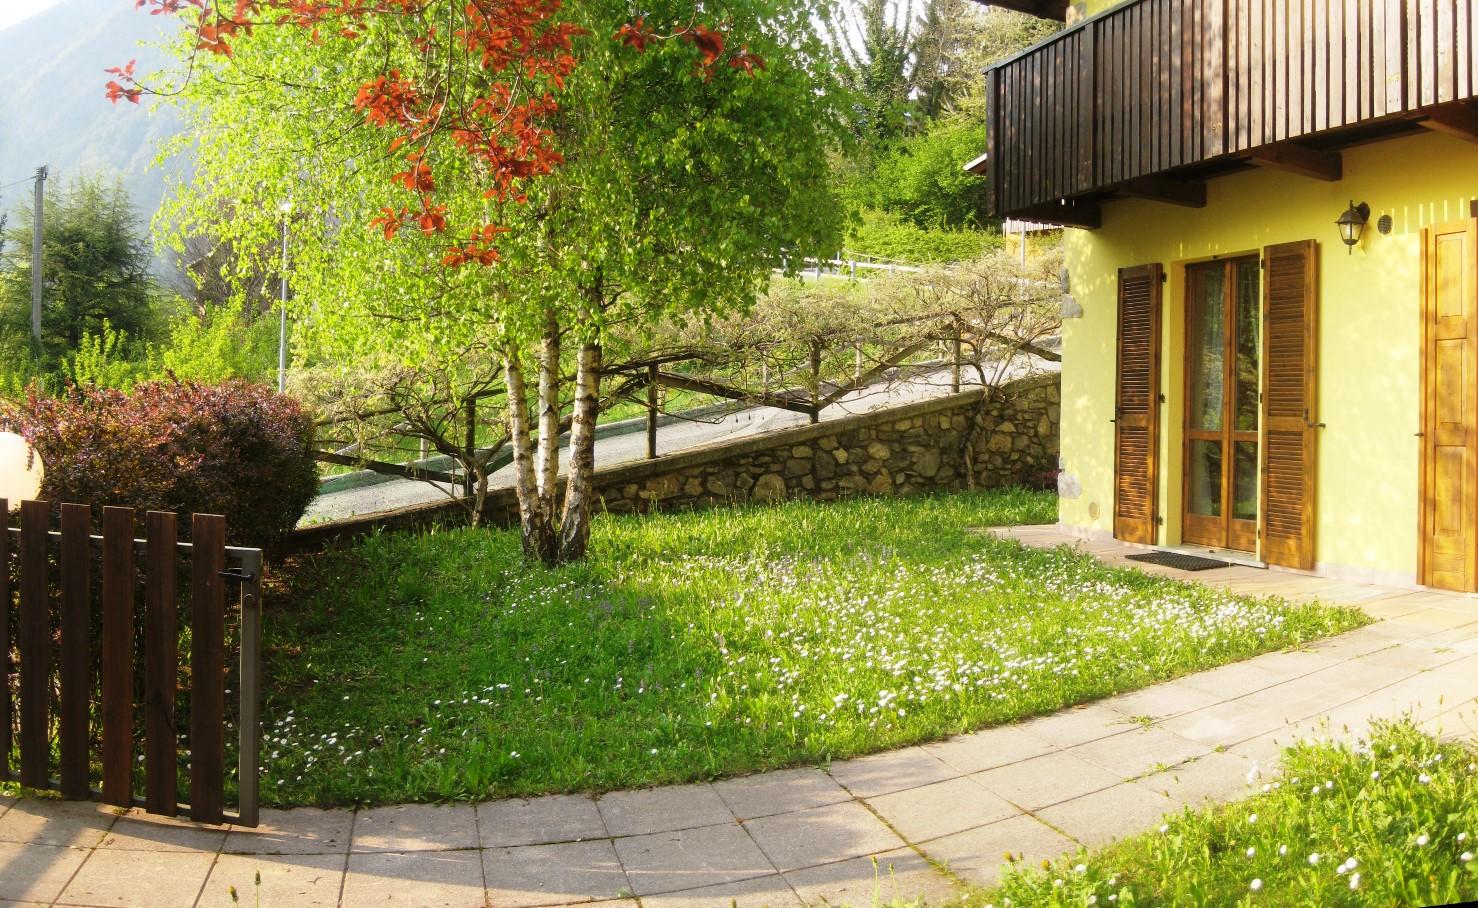 Roncobello villino al piano terra con giardino nicoletta betti case - Case piano terra con giardino ...